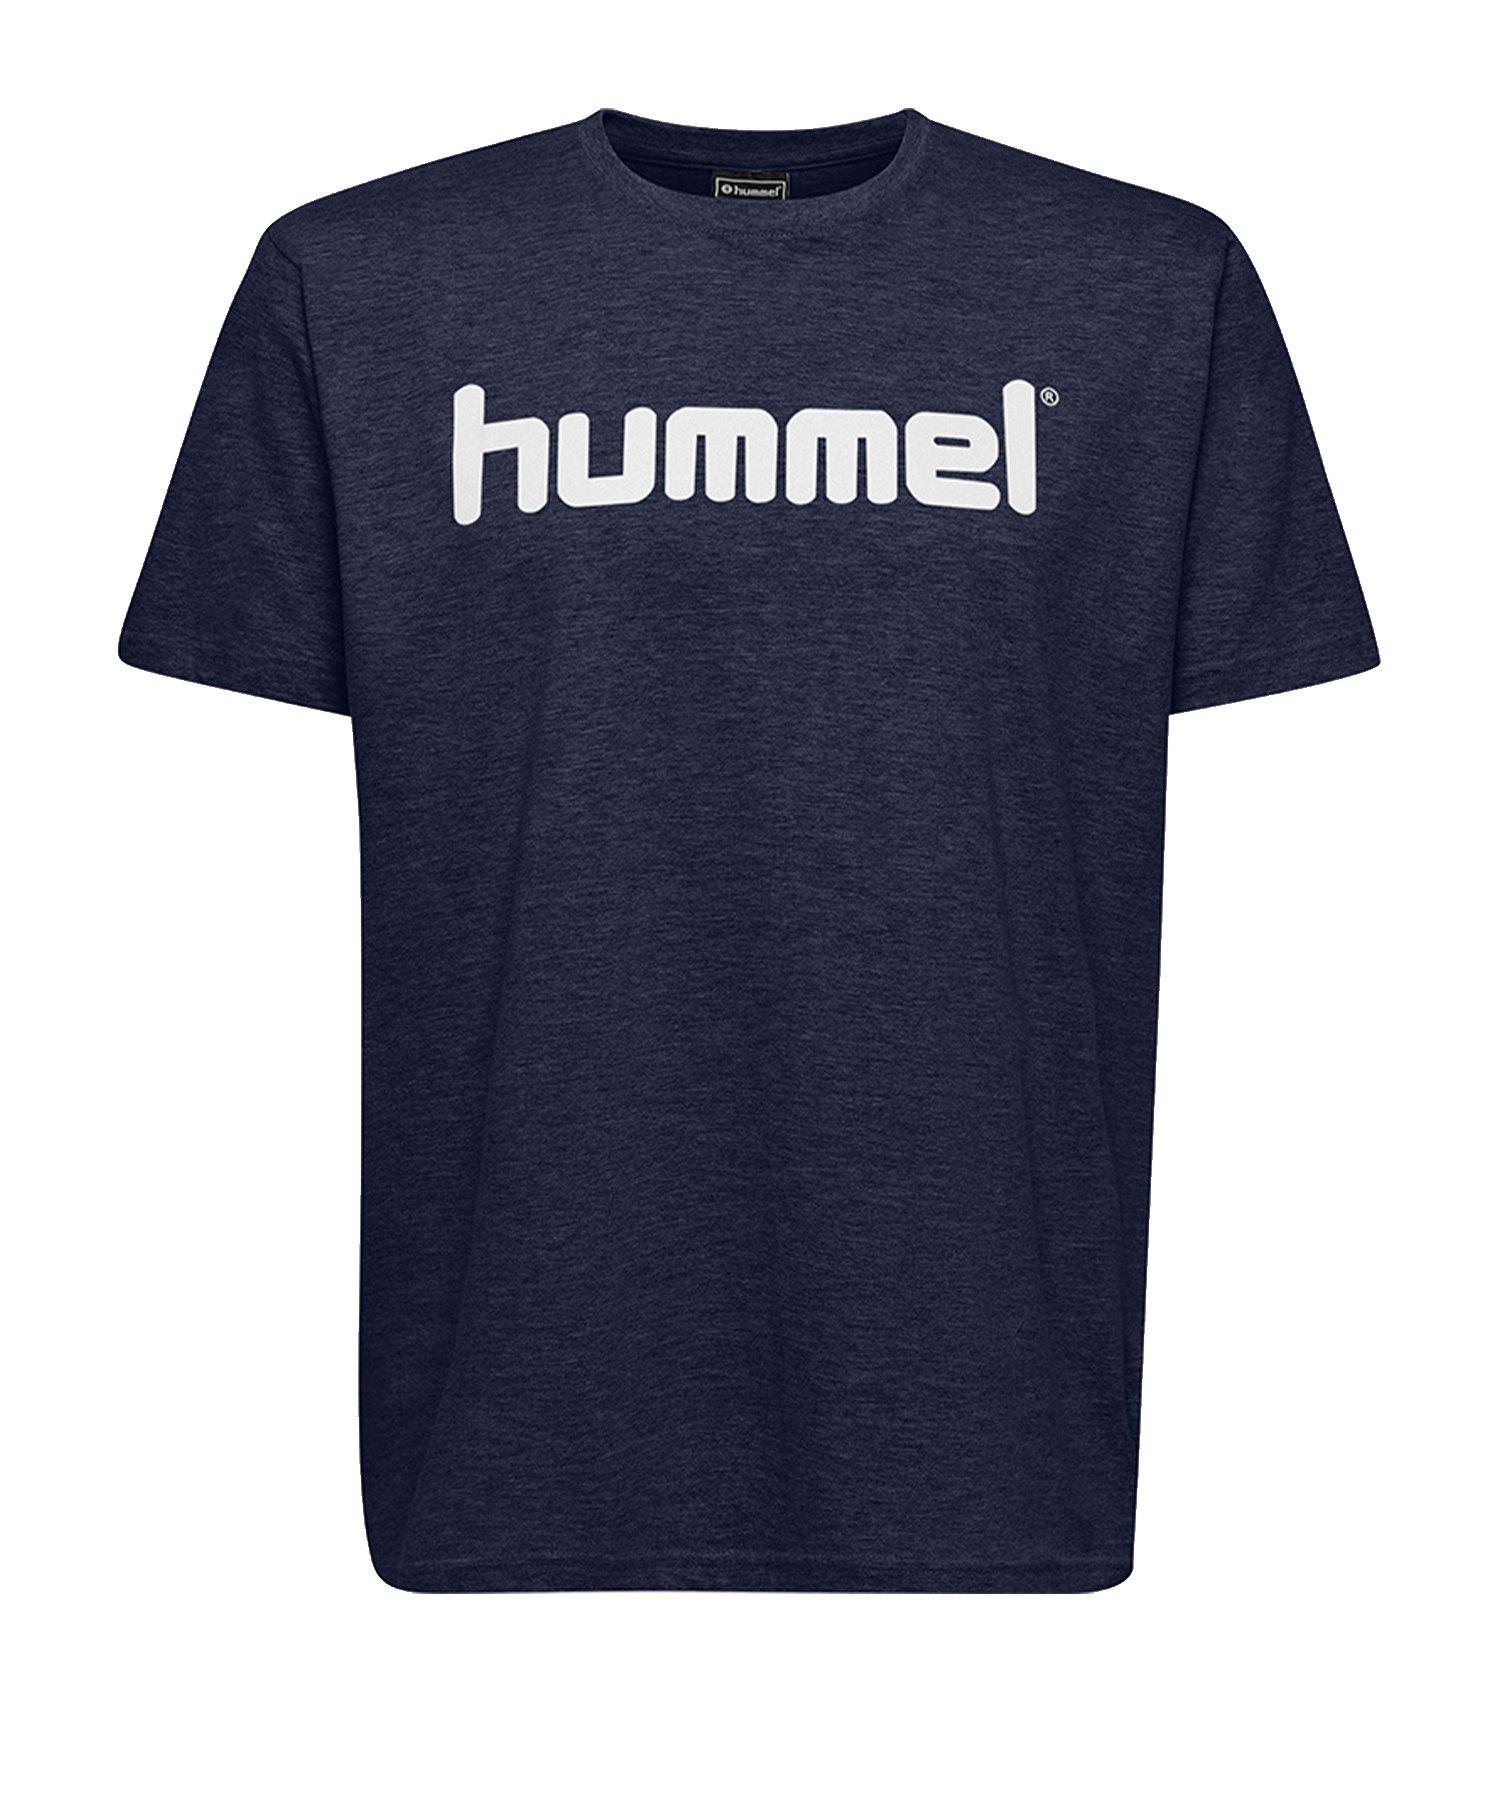 Hummel Cotton T-Shirt Logo Kids Blau F7026 - Blau